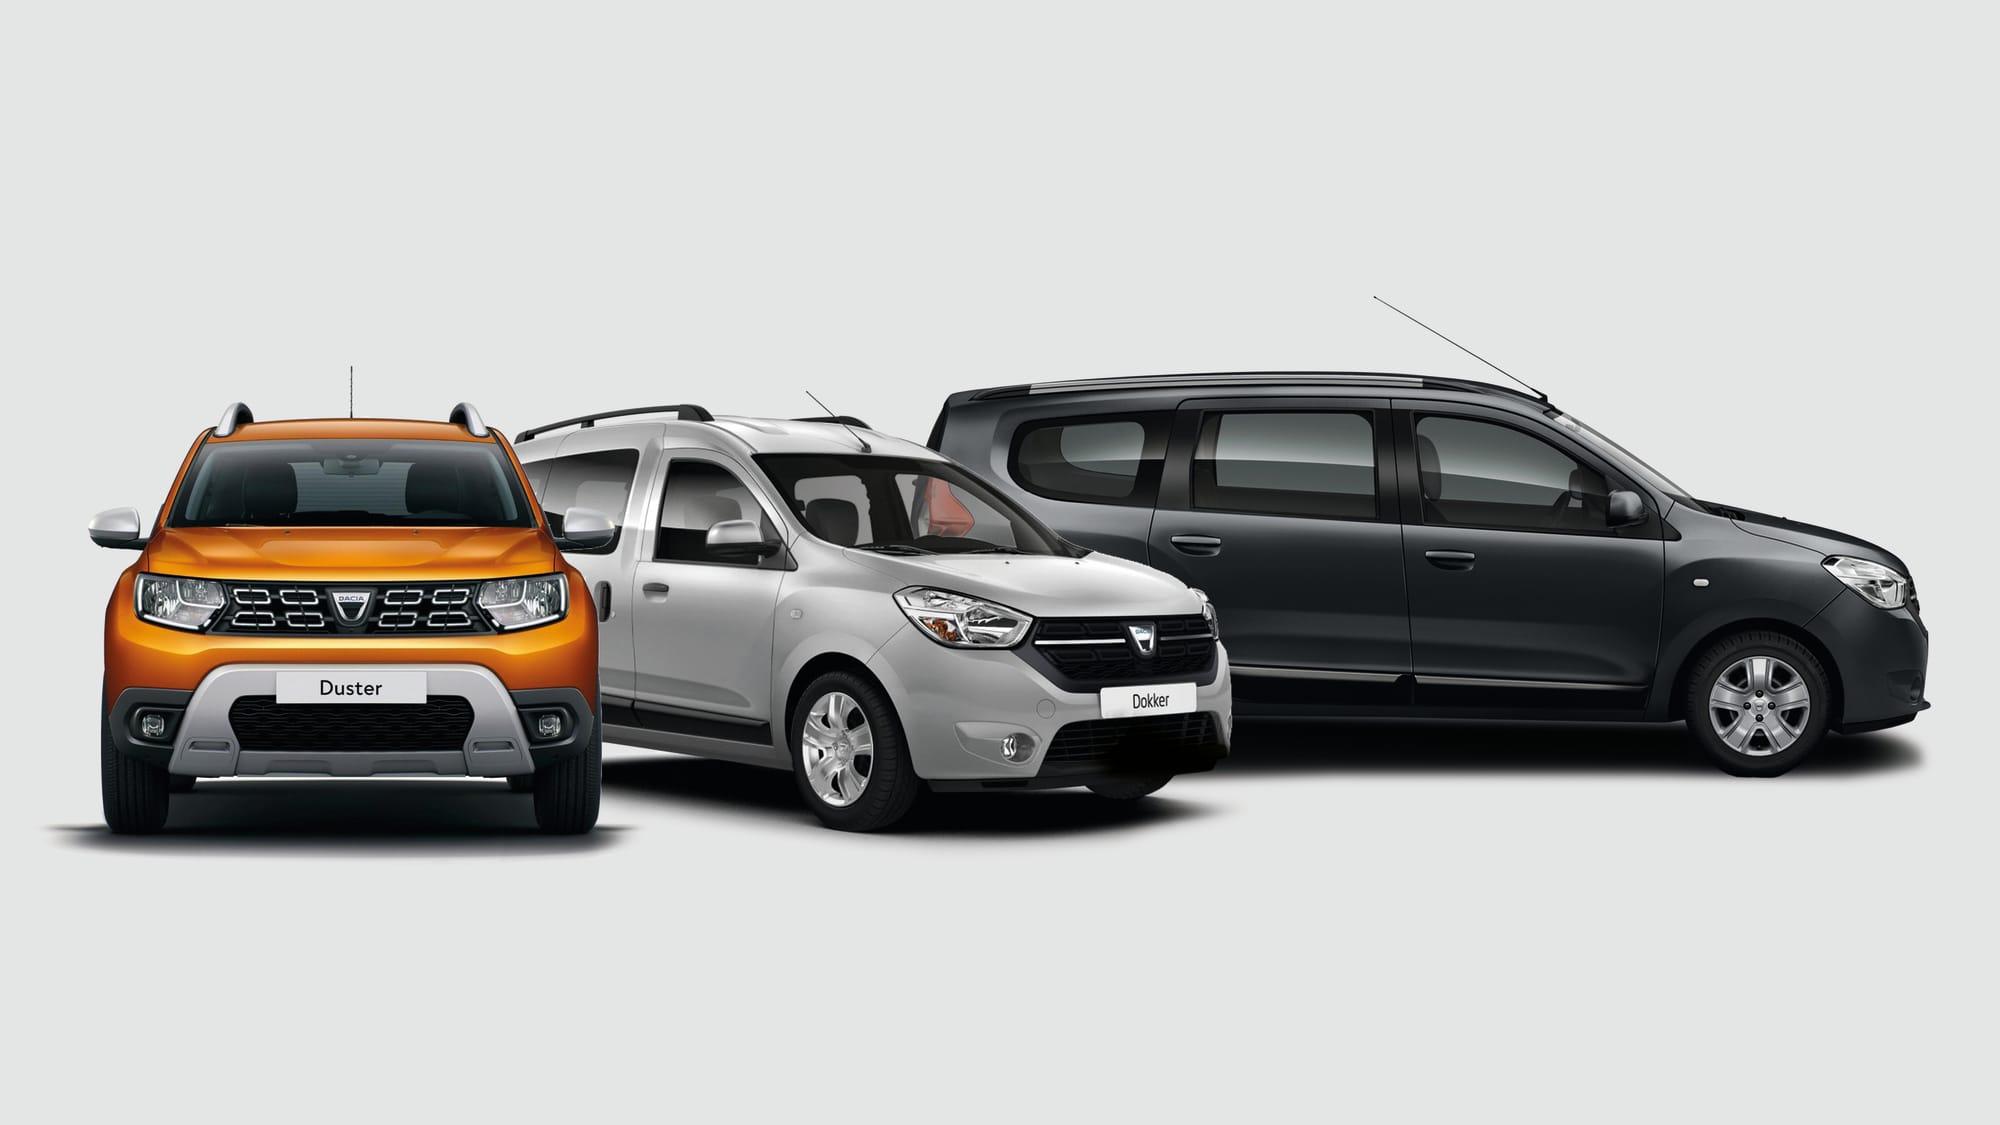 Dacia Duster, Dacia Dokker und Dacia Logan